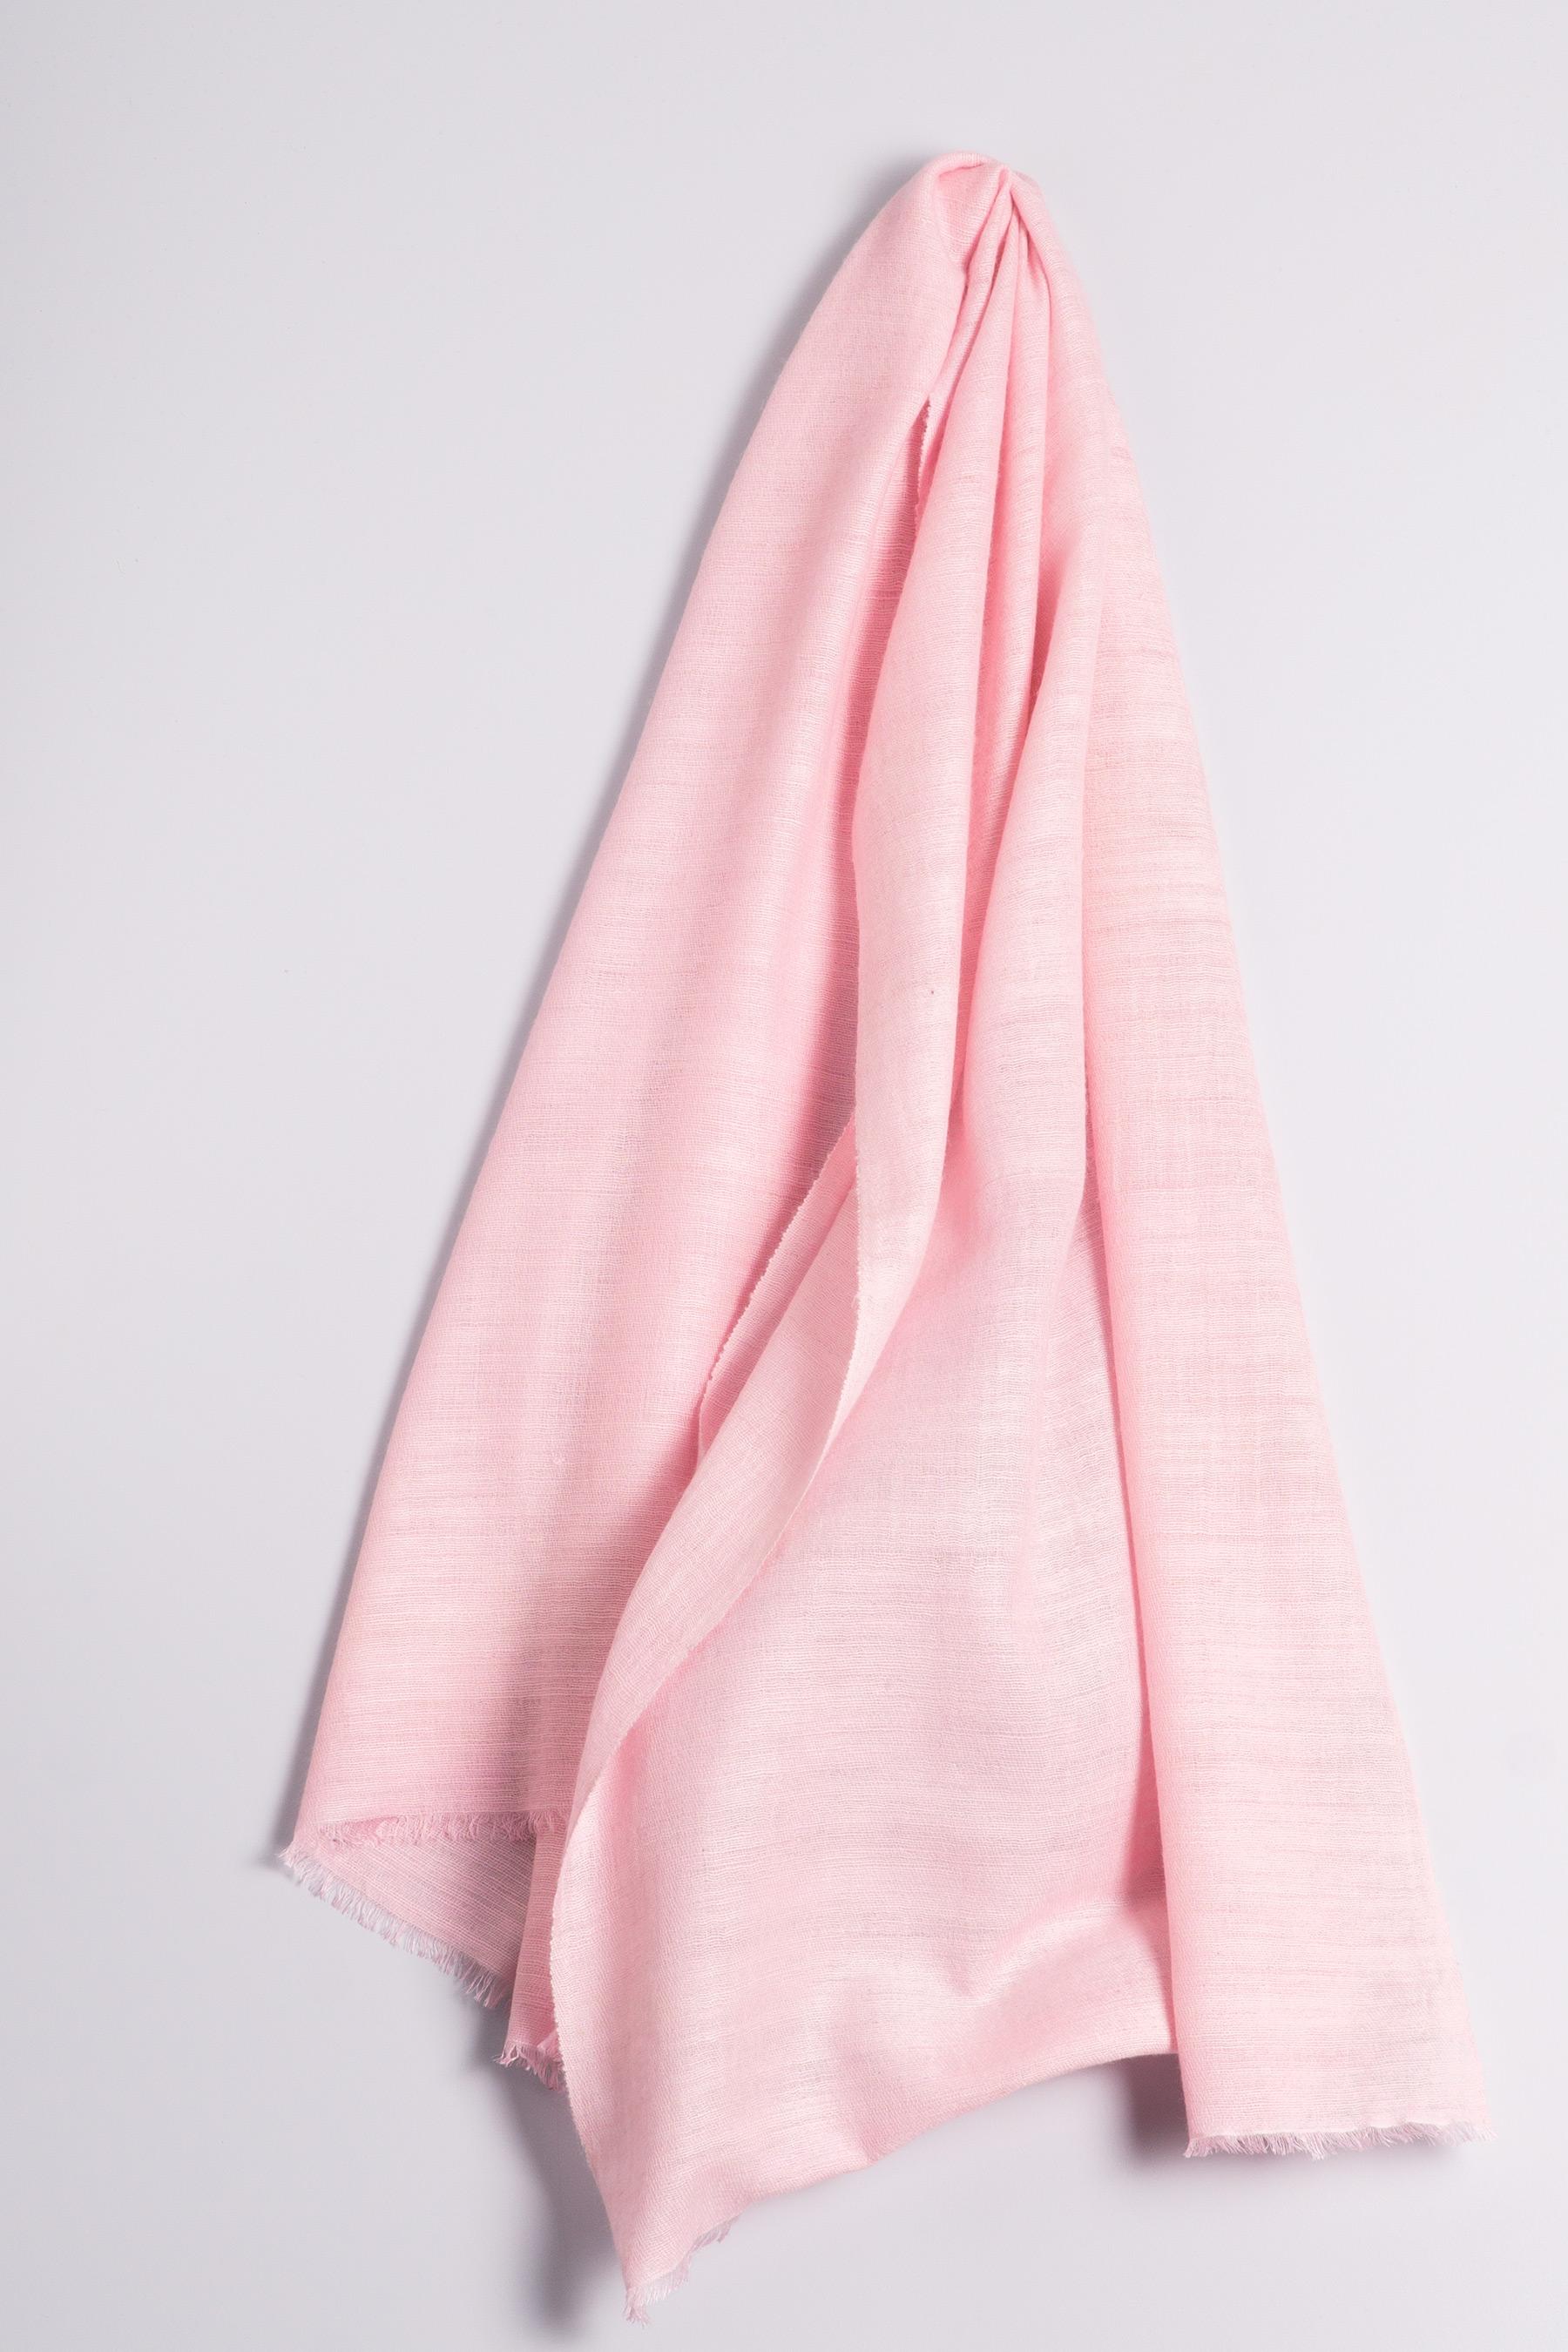 6289b1fa5286dc Shawl Handspun rosé | Shawl handspun | Sjaal | Pashmina-Original.nl